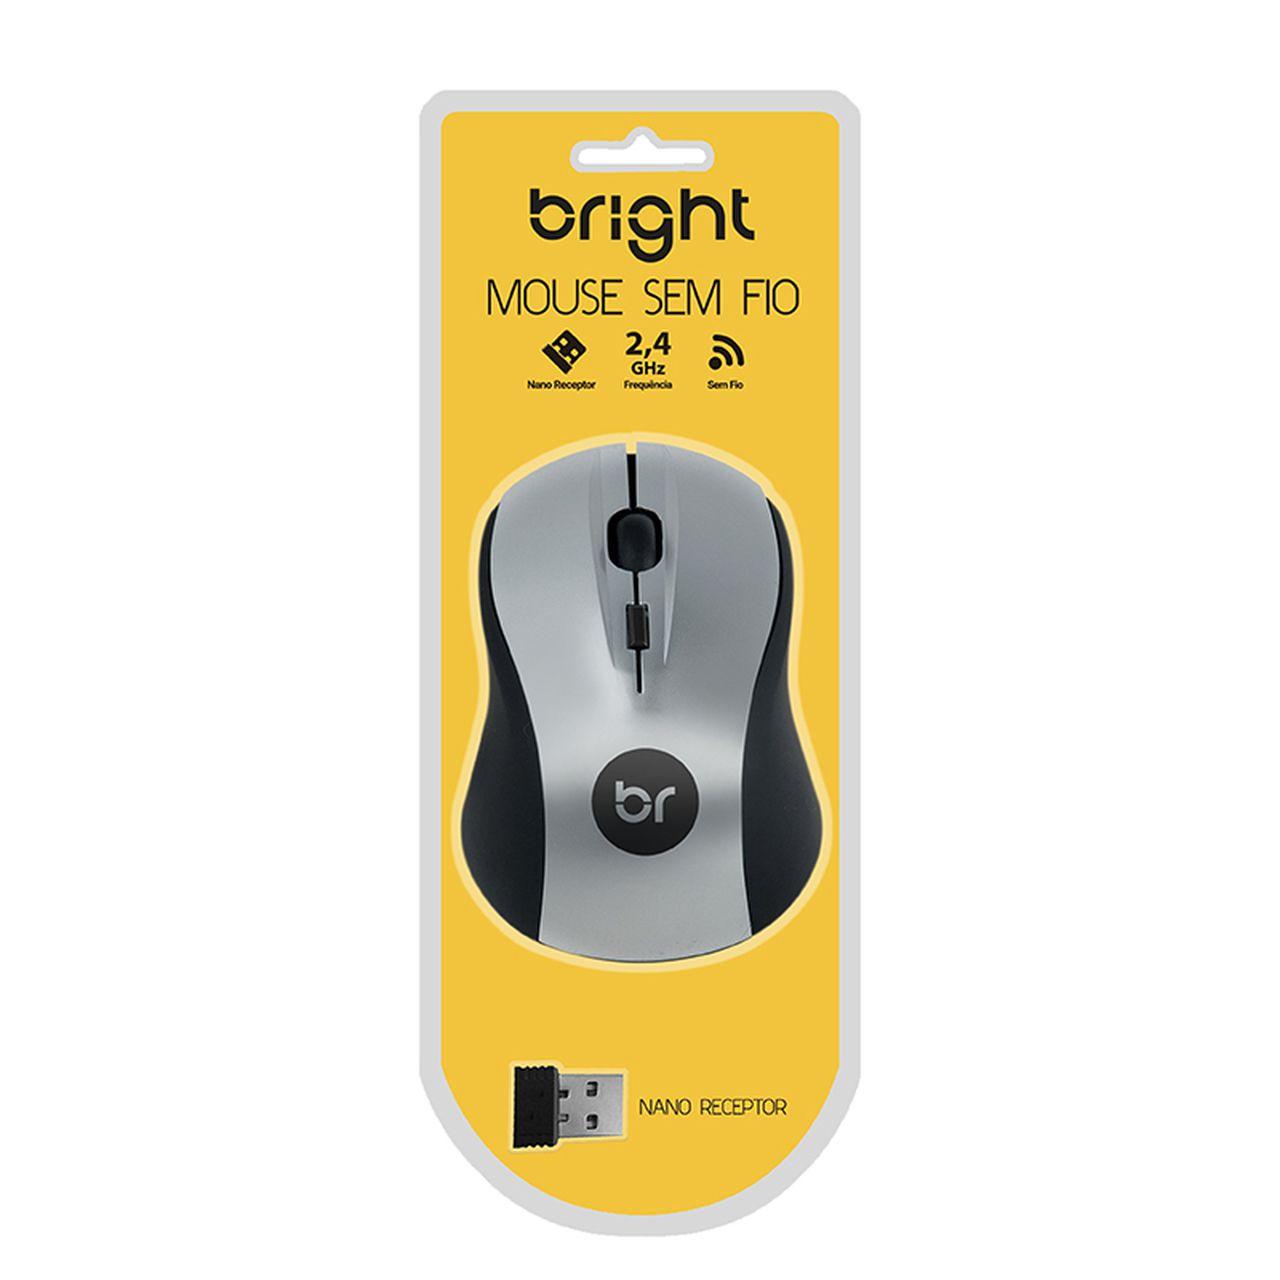 Mouse Sem Fio Suiça Preto e Prata 205 - Bright